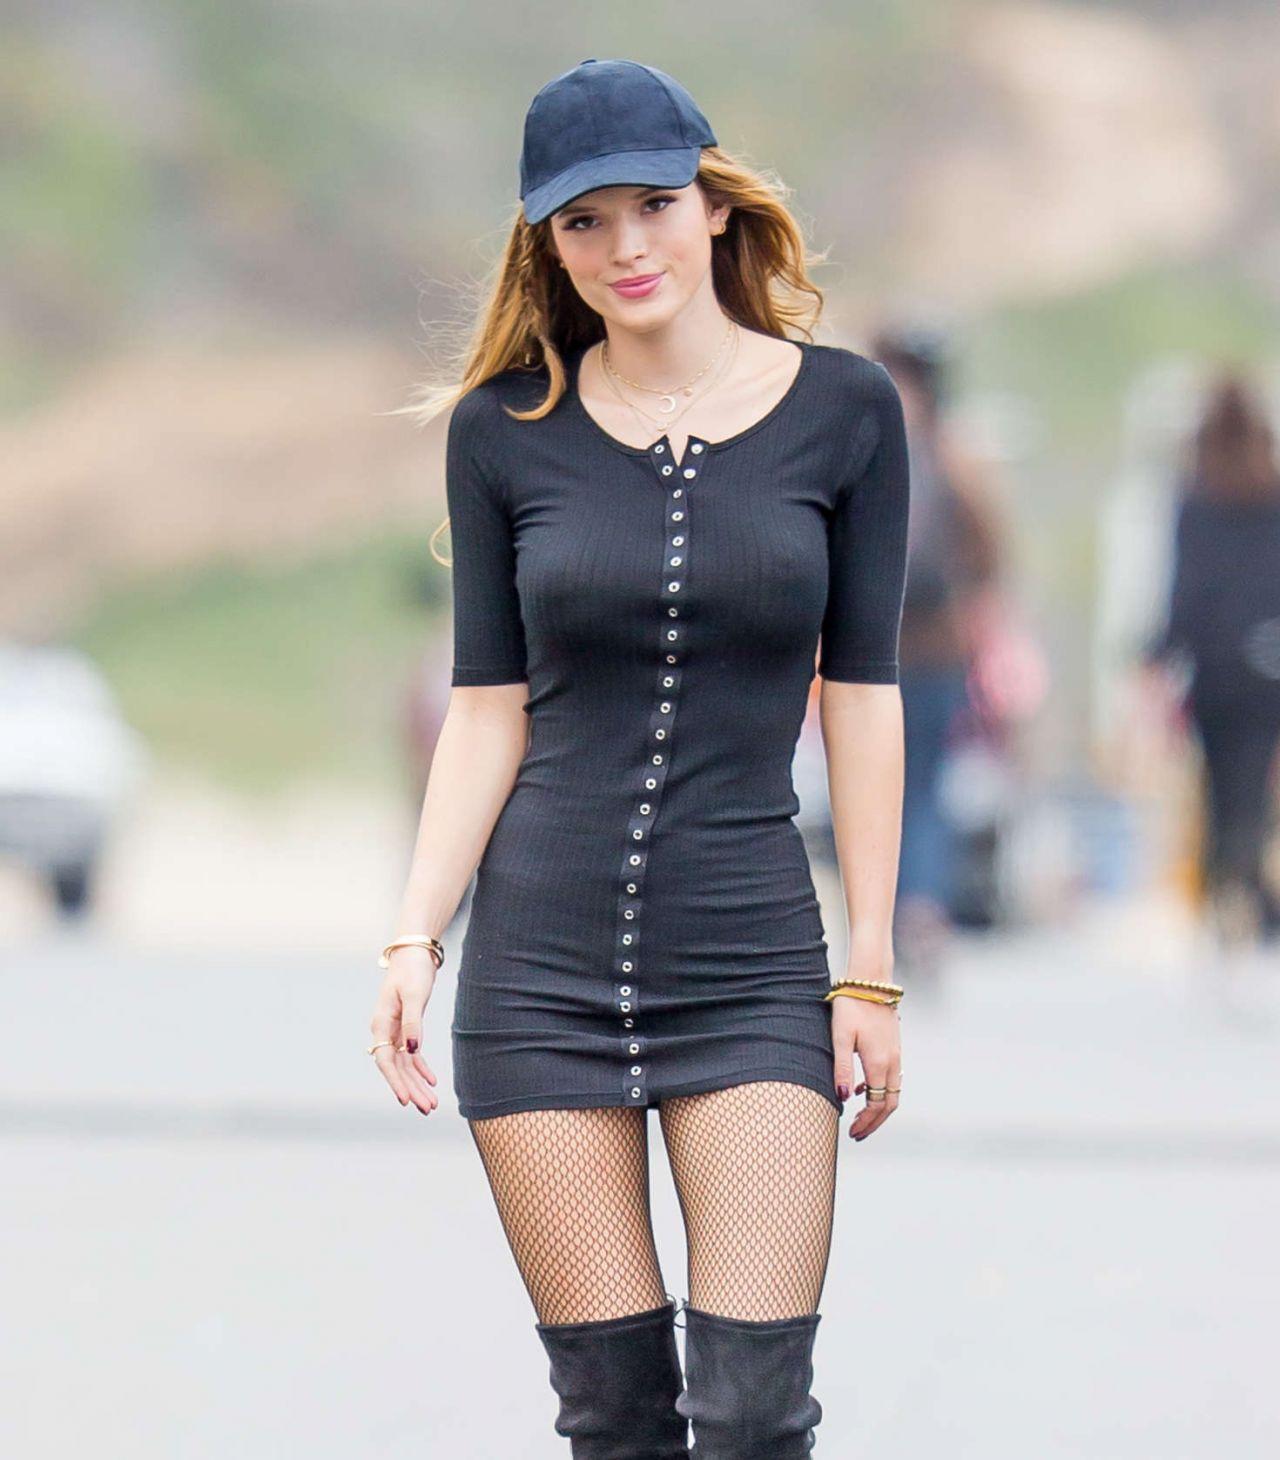 ... – 'You Get Me' Set in San Pedro May-2016 | Stunning Actress